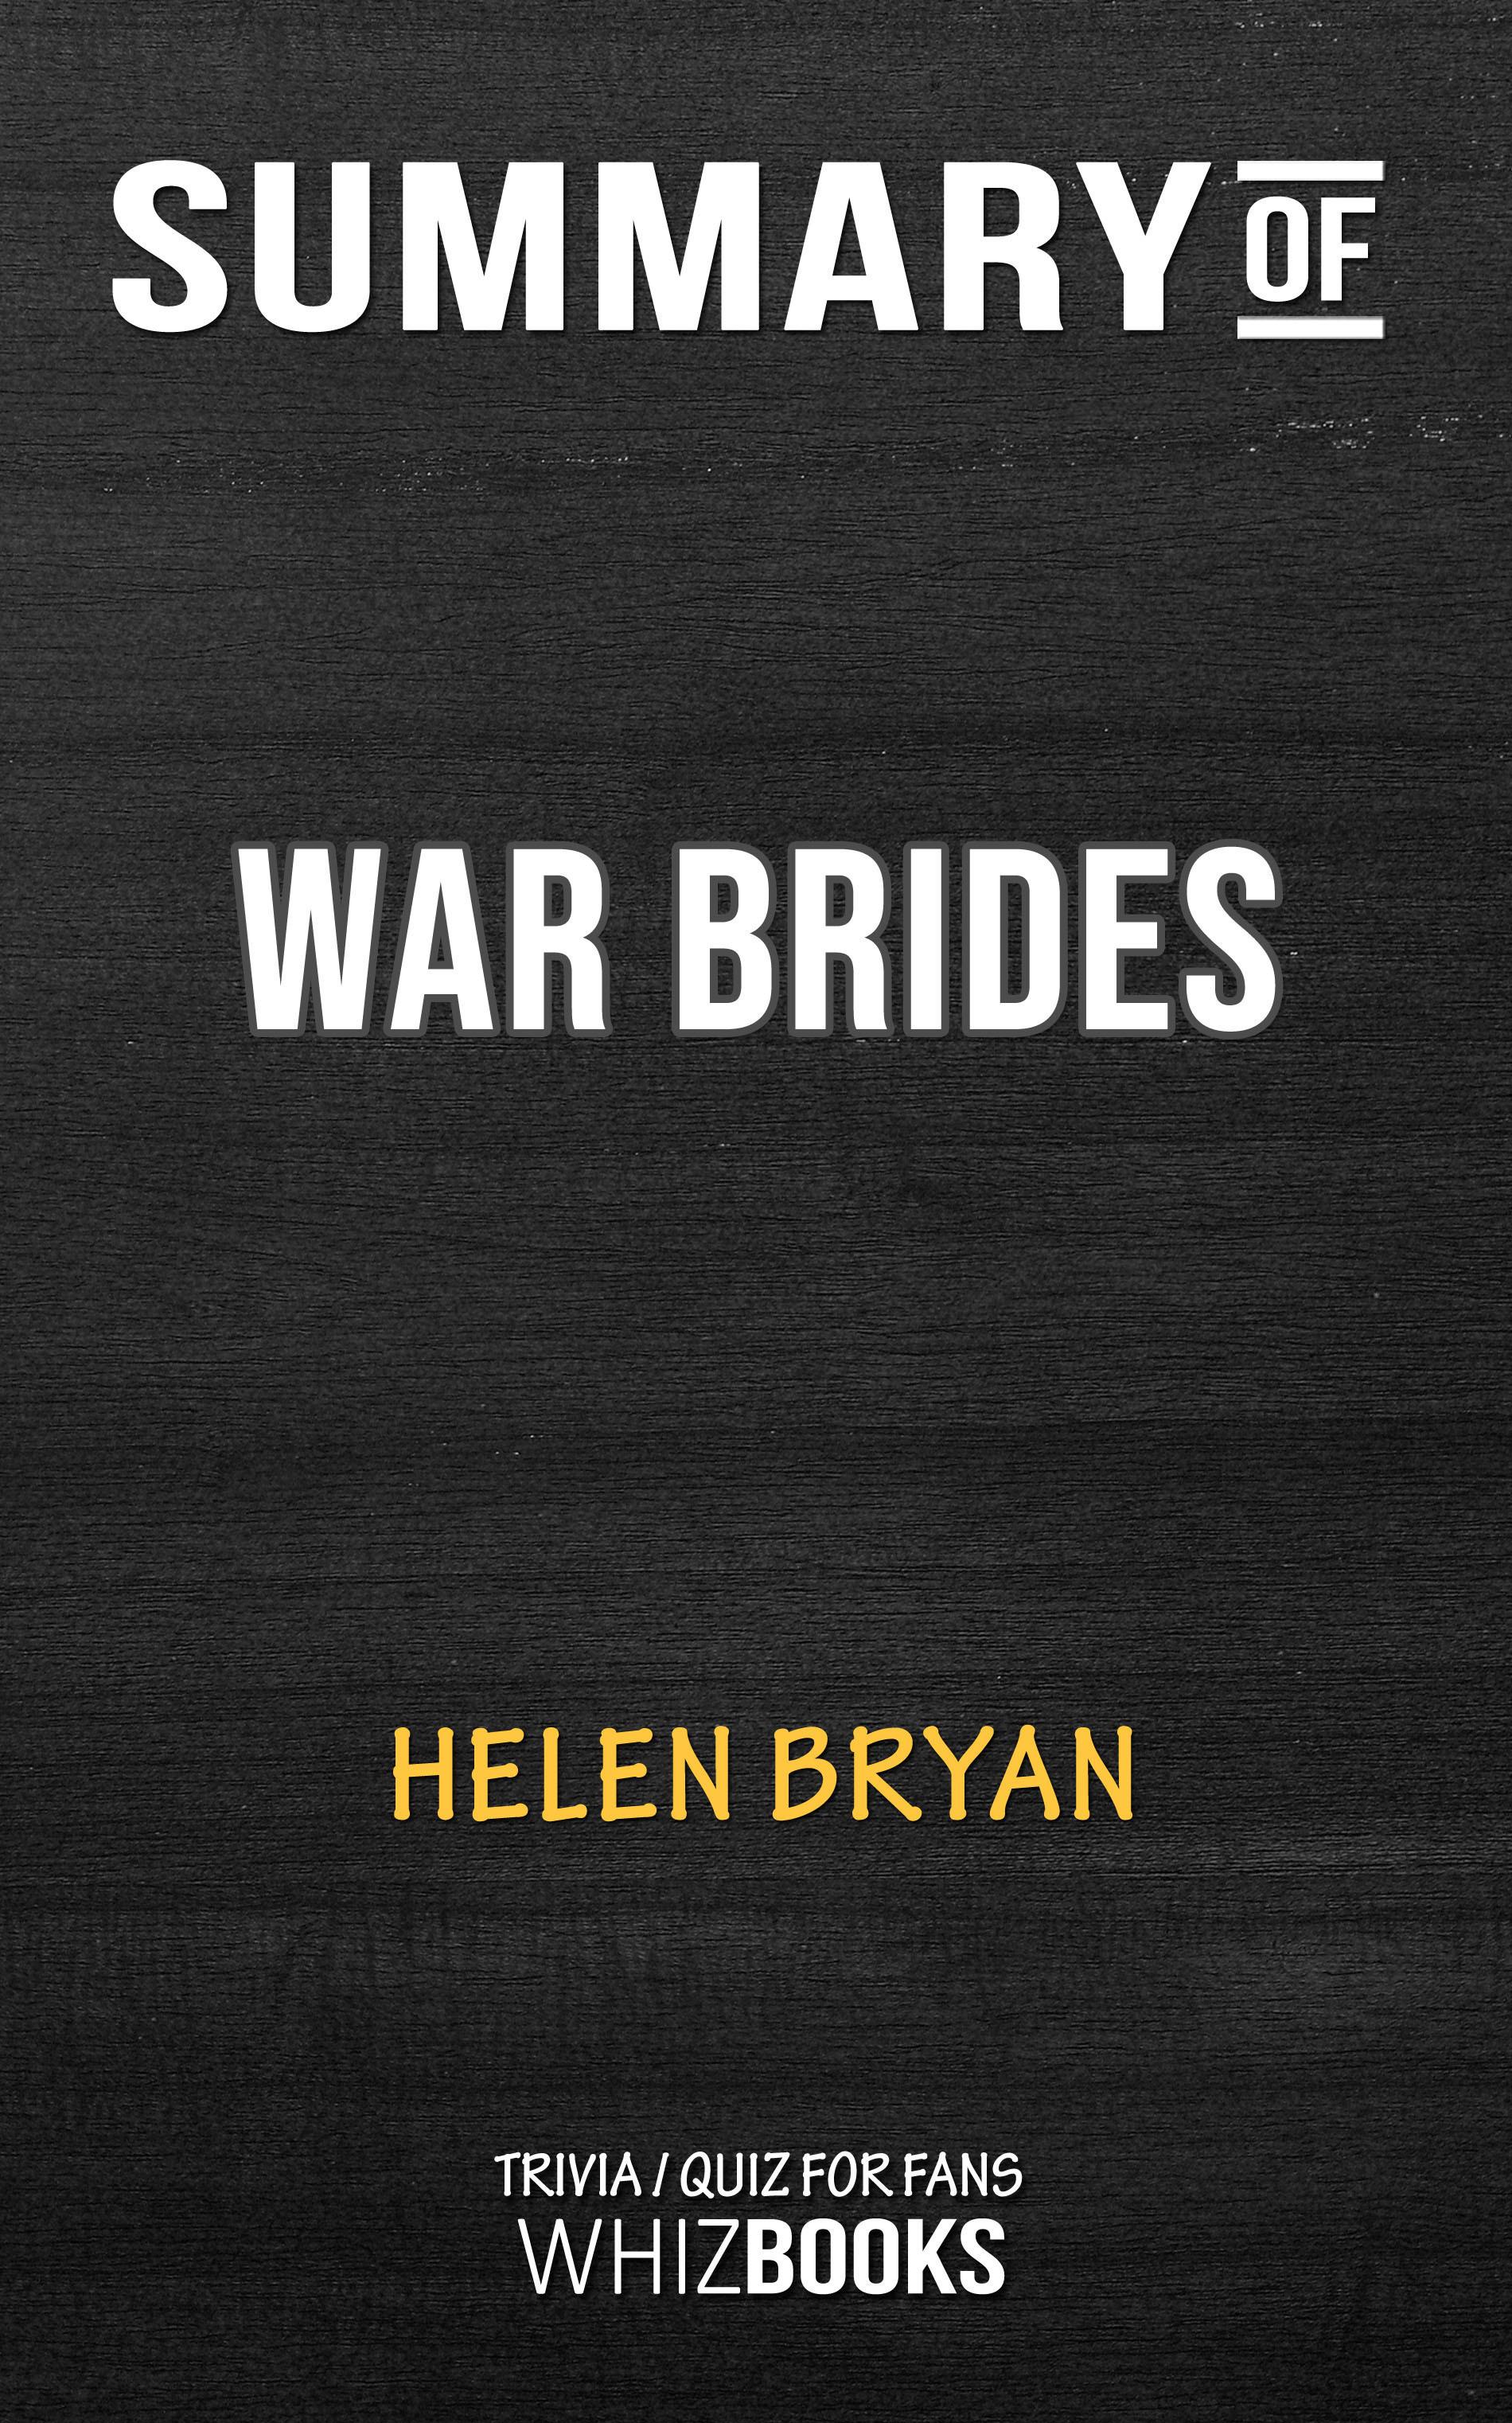 Summary of War Brides by Helen Bryan | Trivia/Quiz for Fans